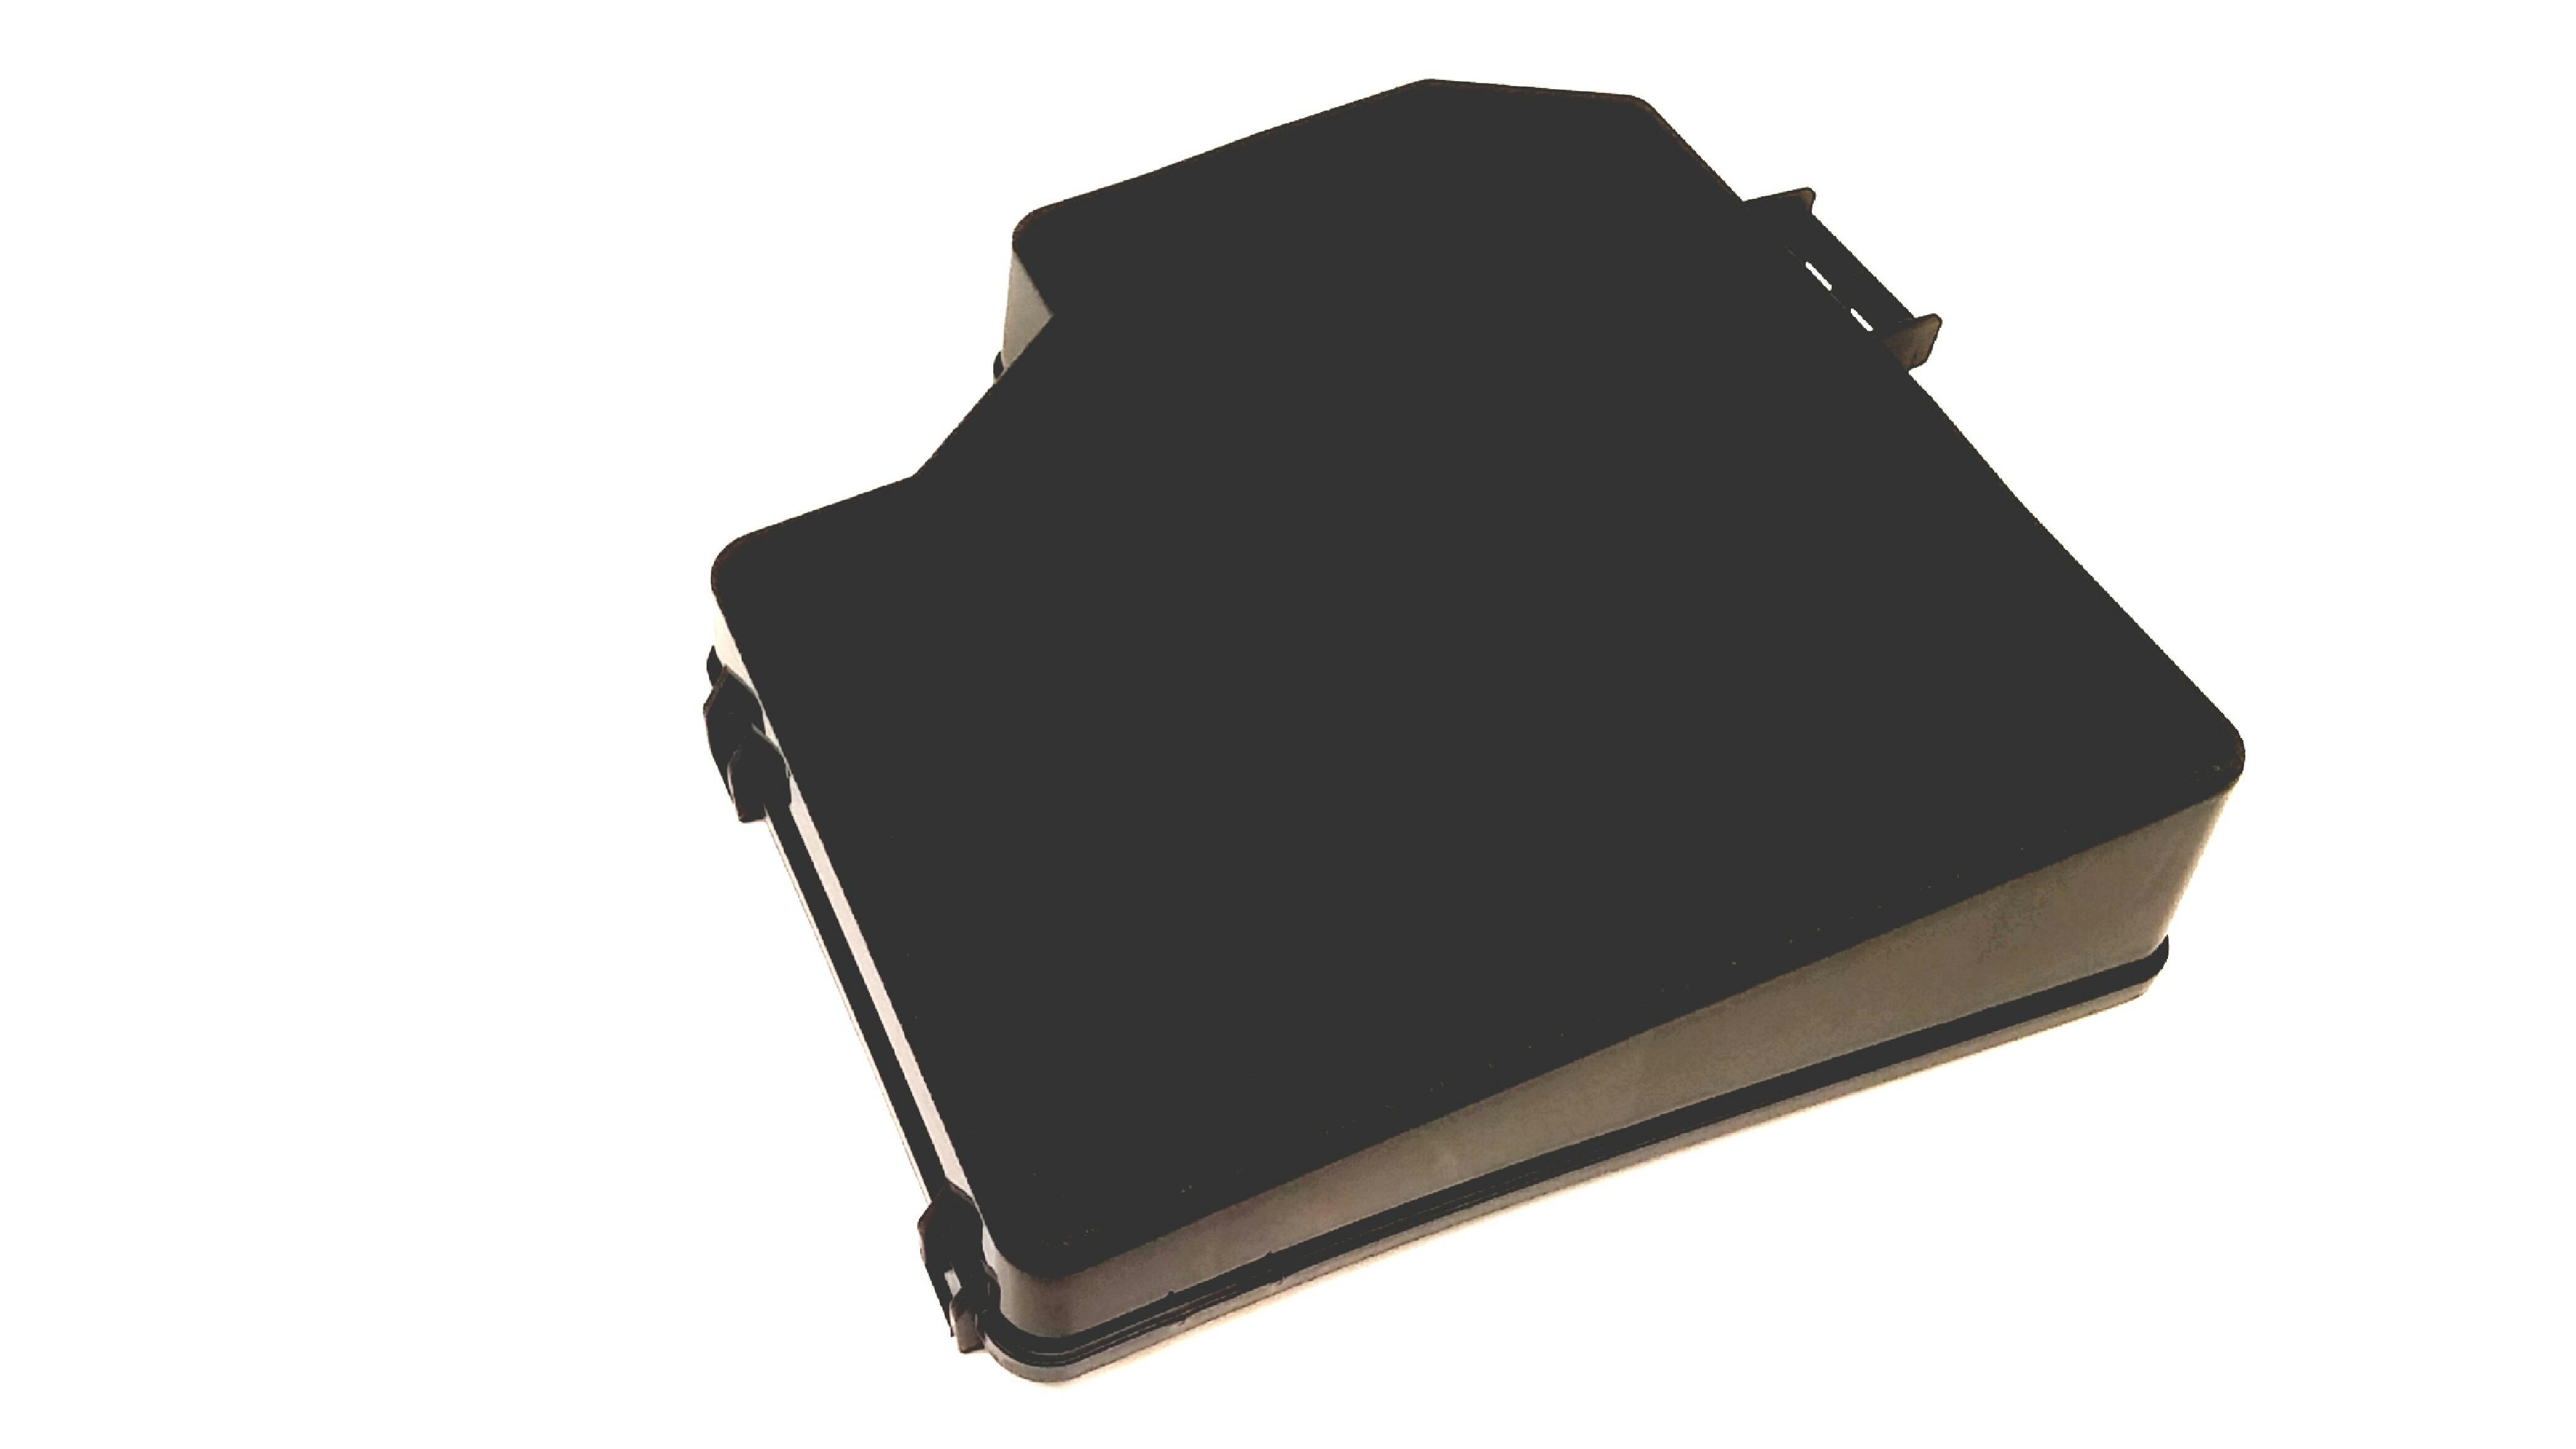 Subaru Brz Fuse Box Cover  Upper   Wiring  Main  Harness